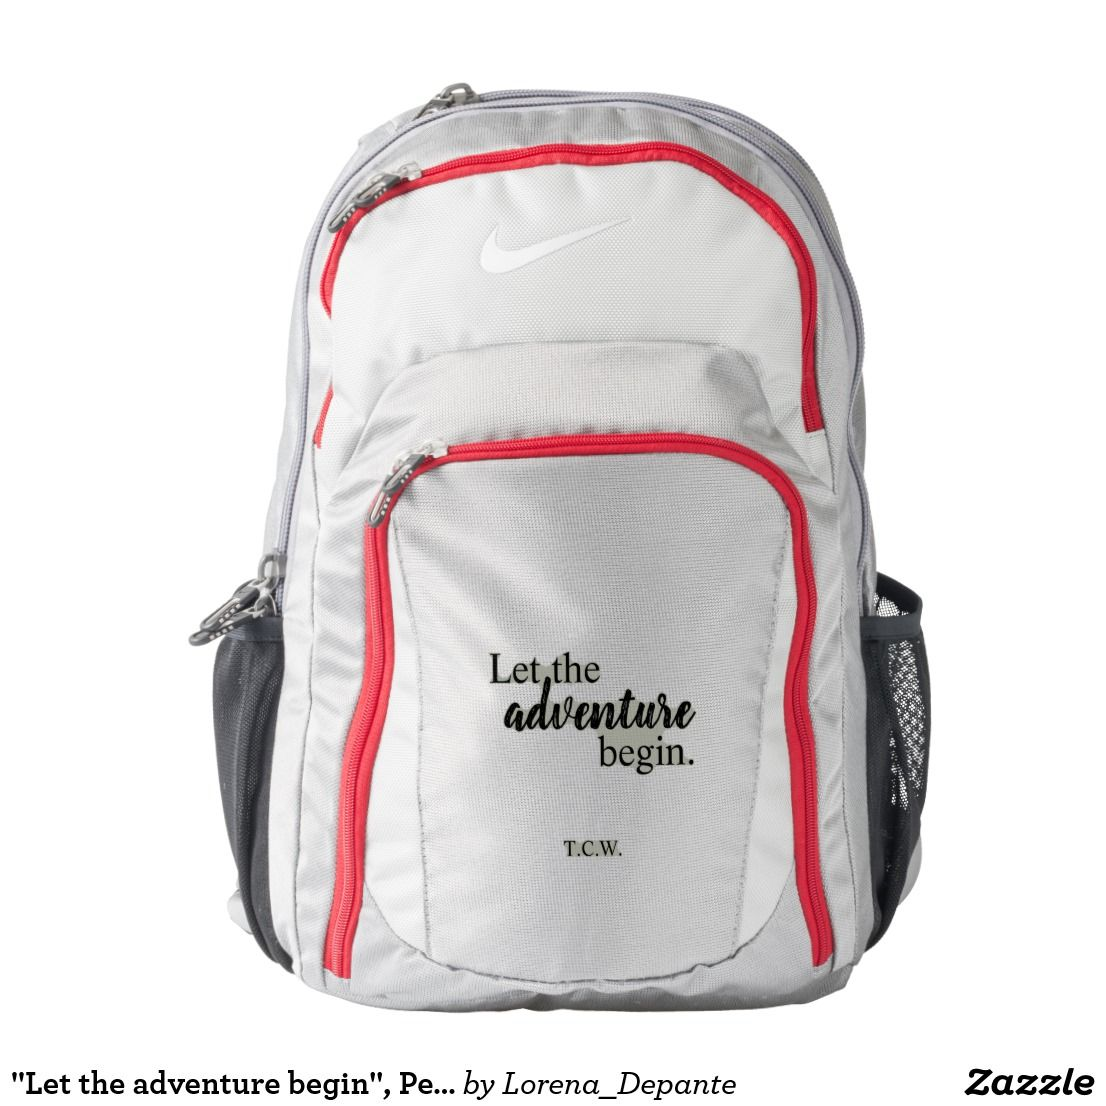 Hibbett Sports School Backpacks  38aa4241a44fe